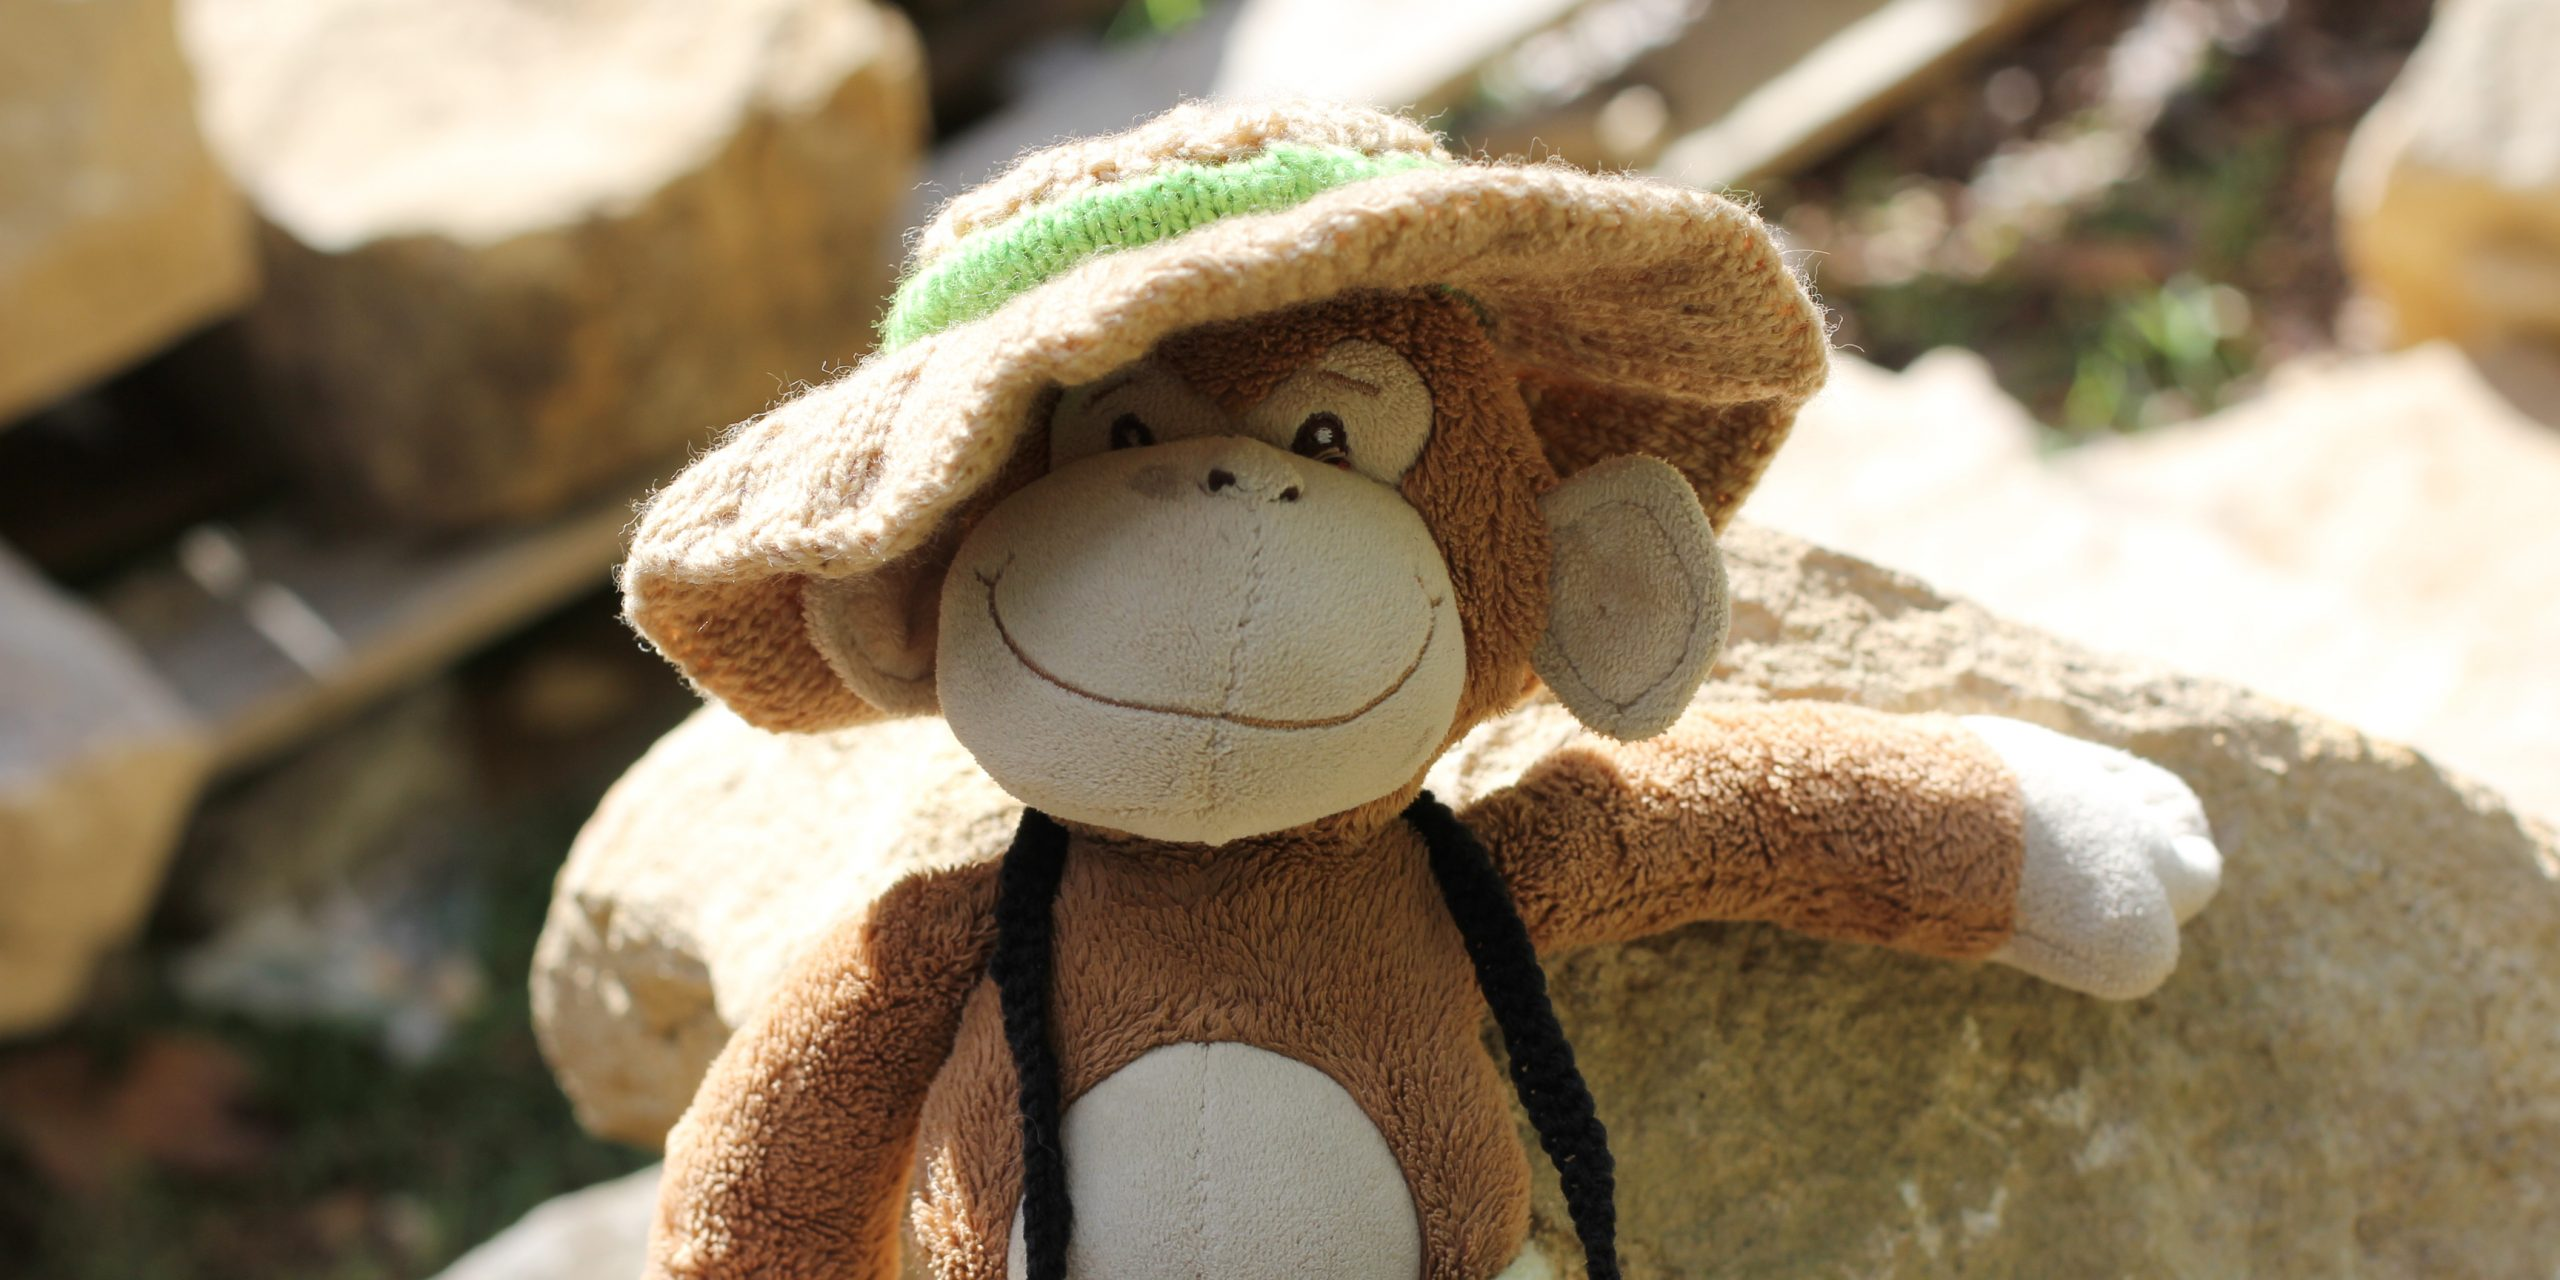 Monkey wearing a knitted hat